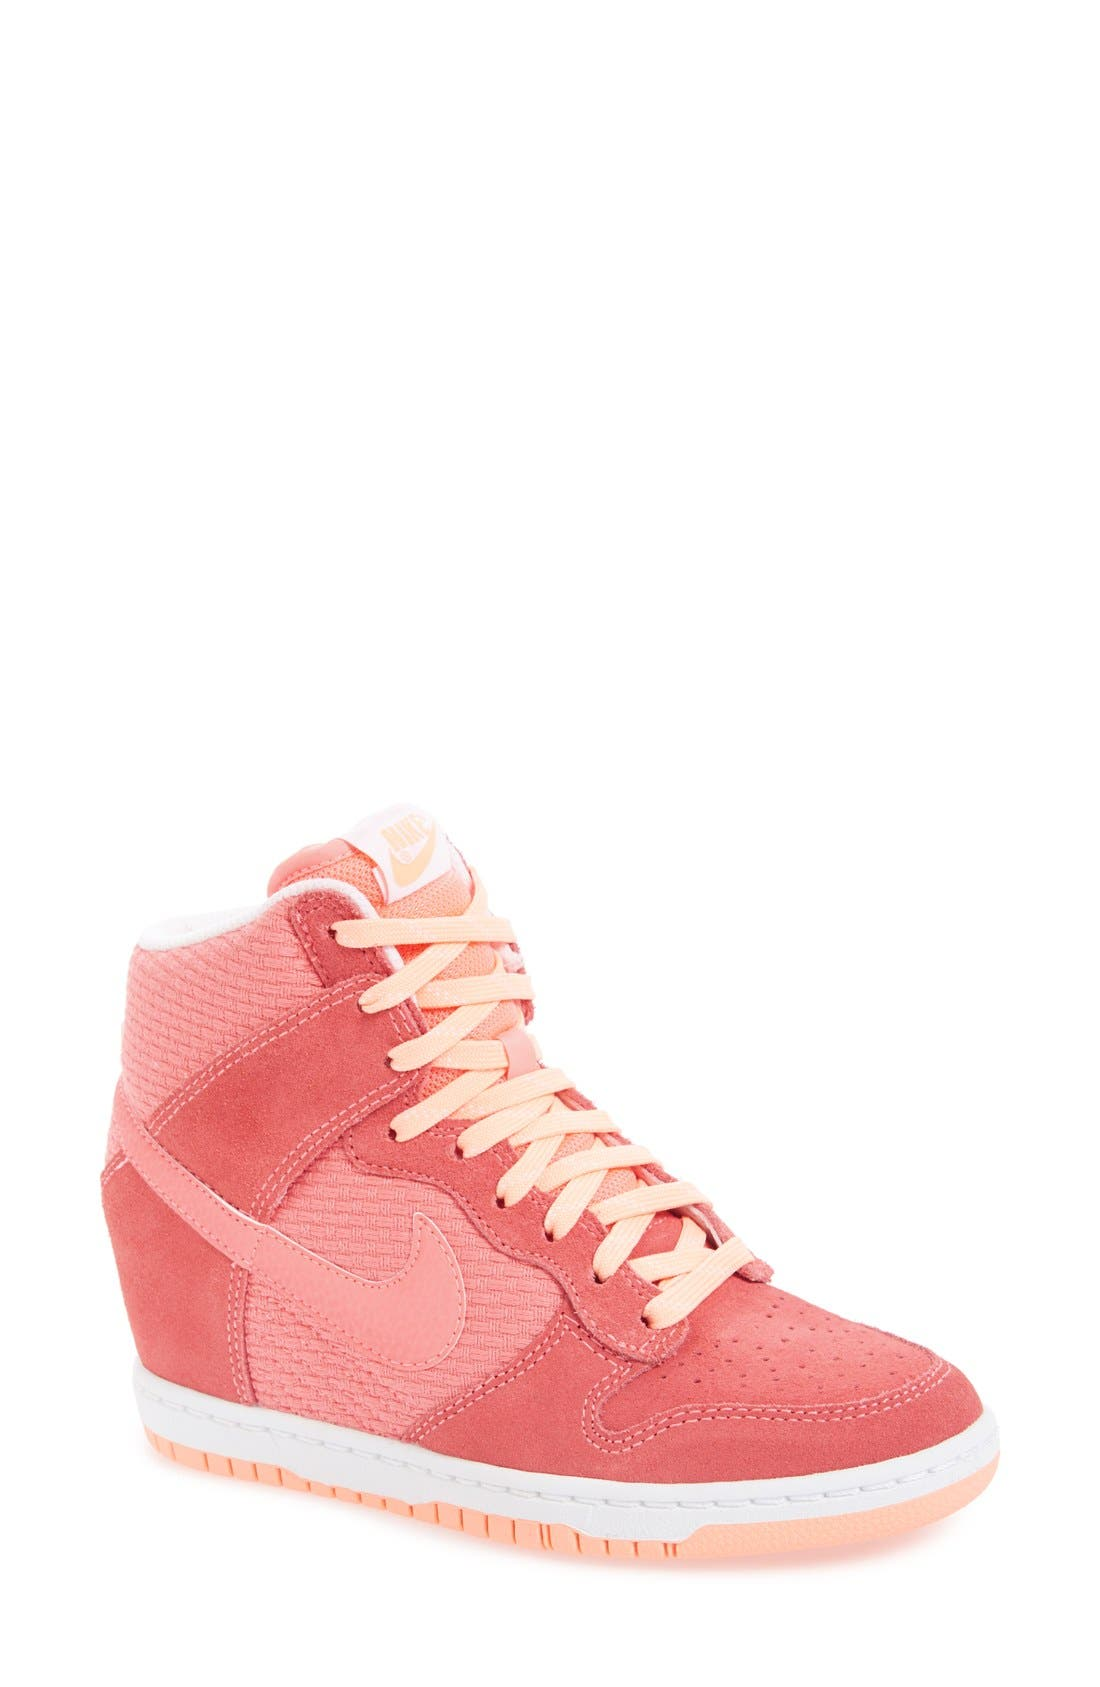 Alternate Image 1 Selected - Nike 'Dunk Sky Hi - Essential' Wedge Sneaker (Women)